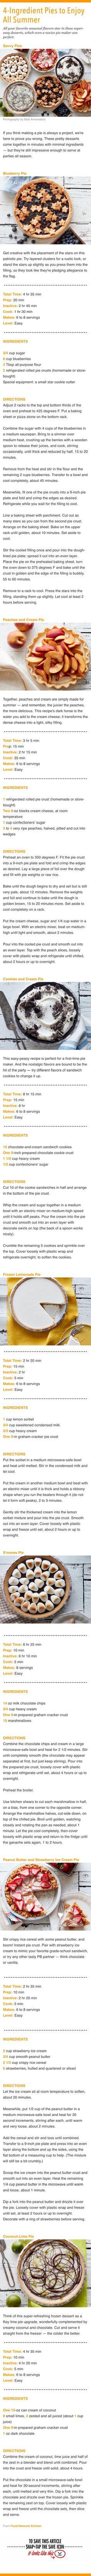 4 ingredient pies